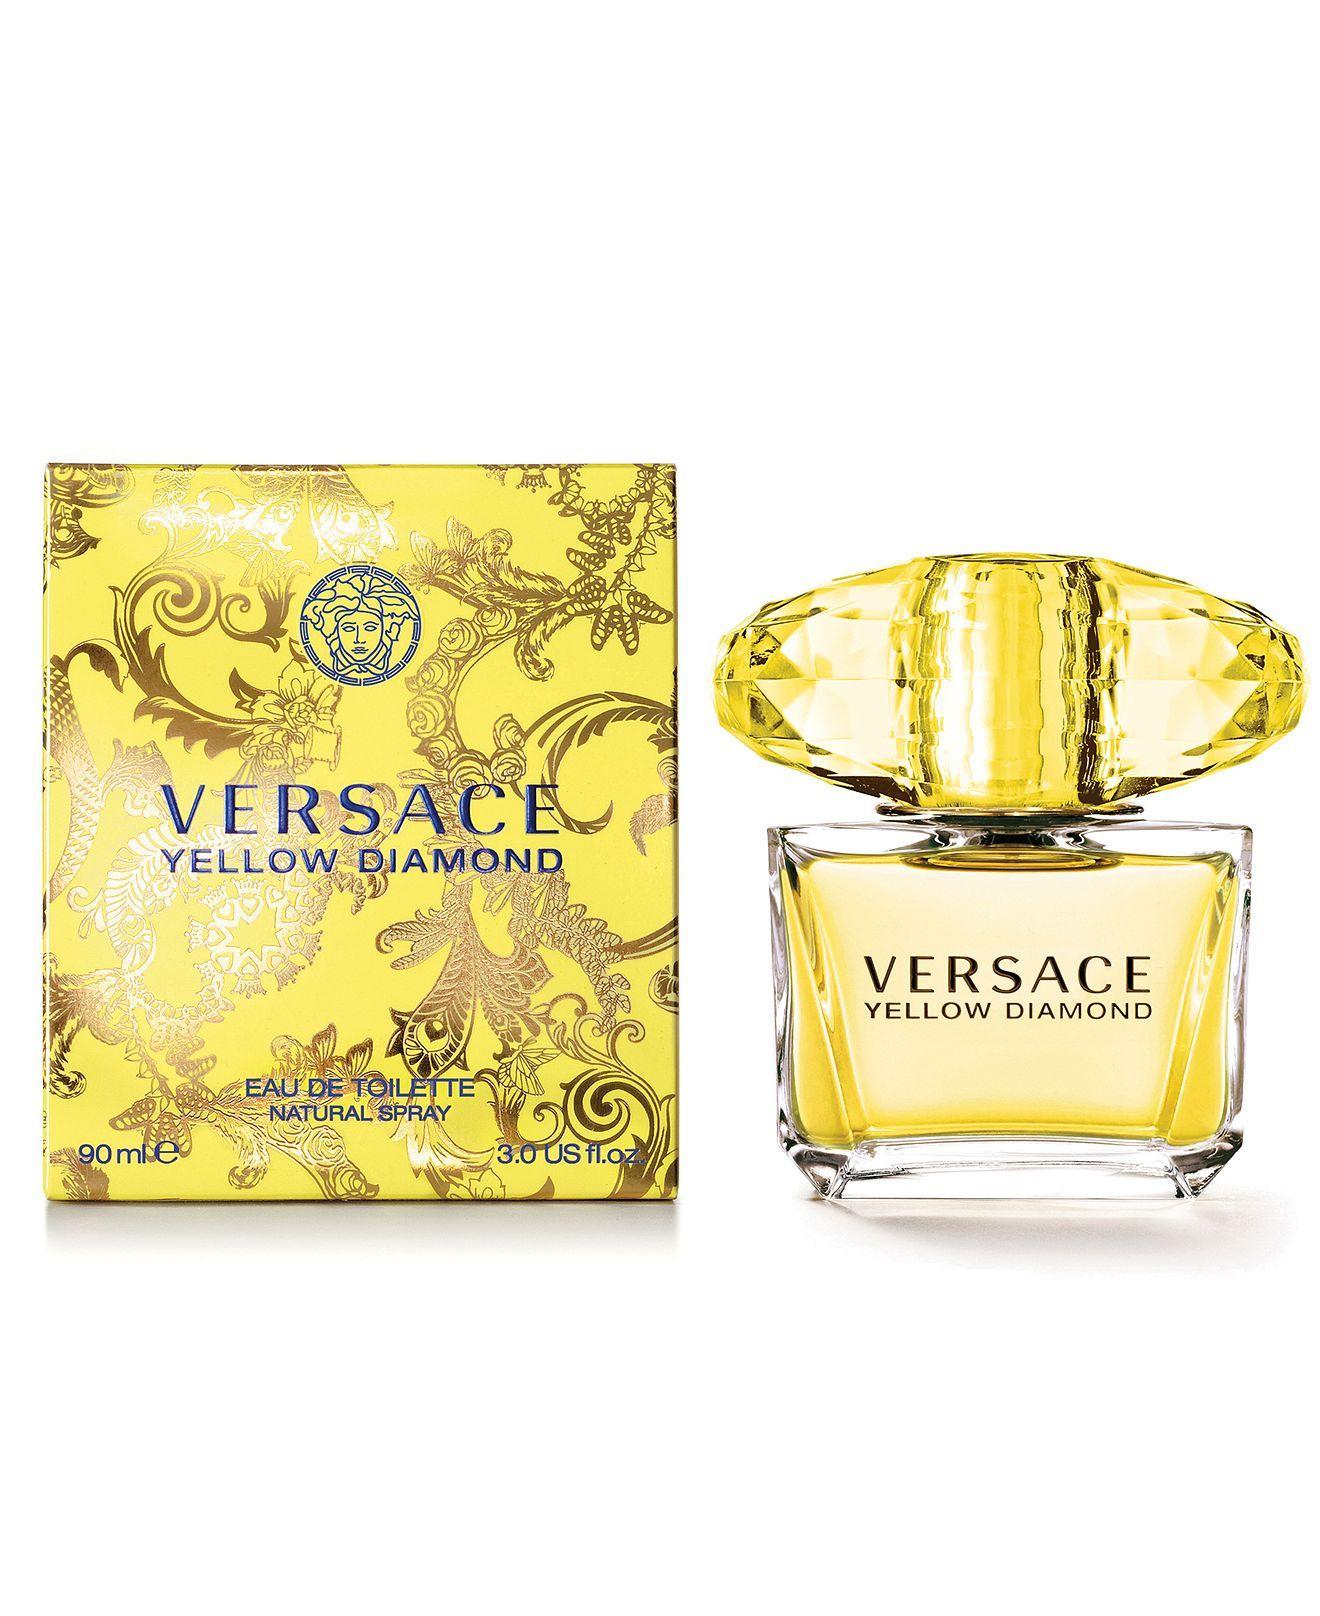 Yellow Diamond Eau de Toilette Spray, 3 oz Versace